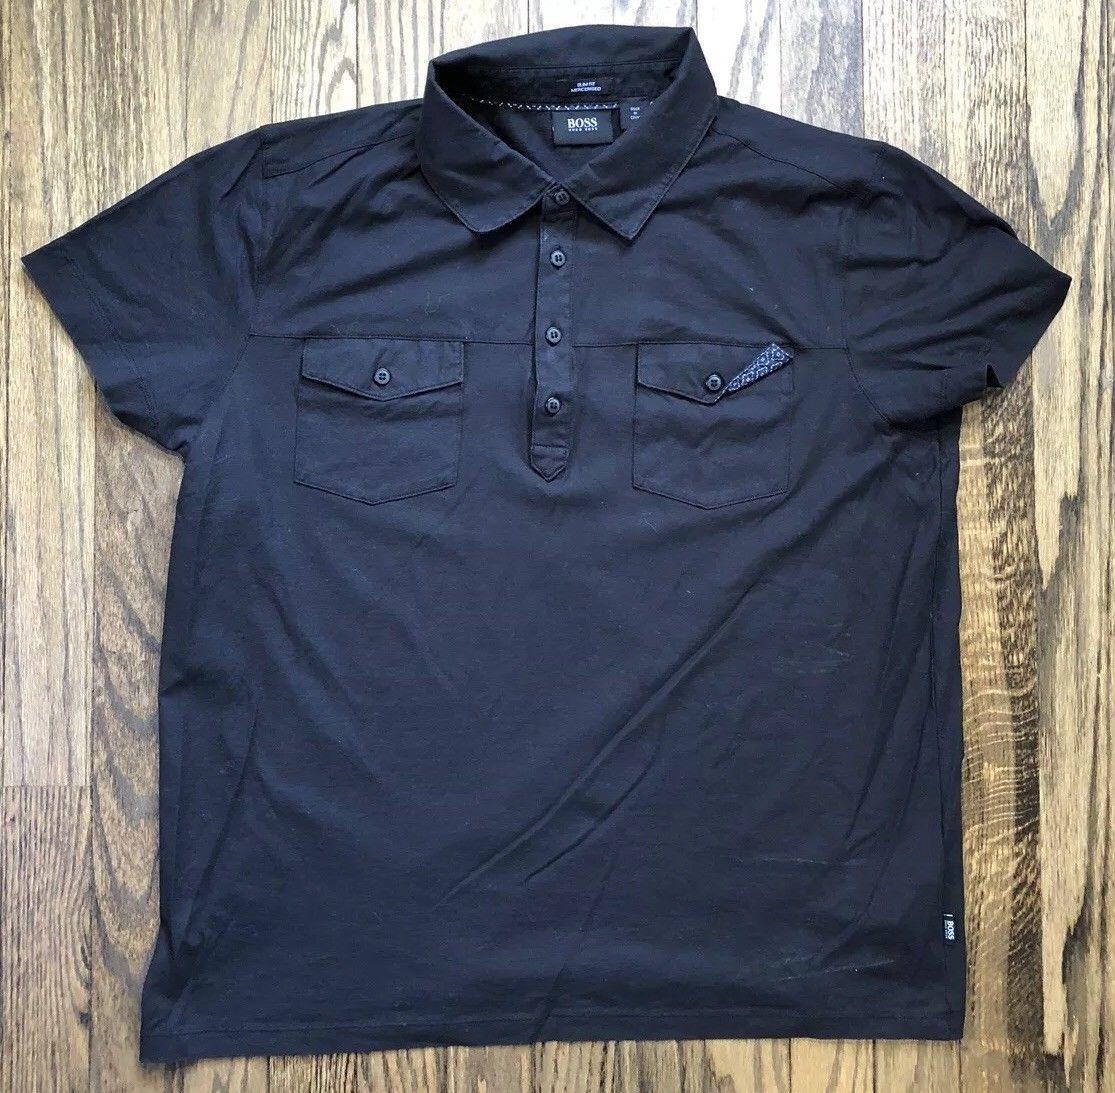 0c17cd69 S l1600. S l1600. Previous. Hugo Boss Mens Slim Fit Short Sleeve Polo Shirt  International Size XL